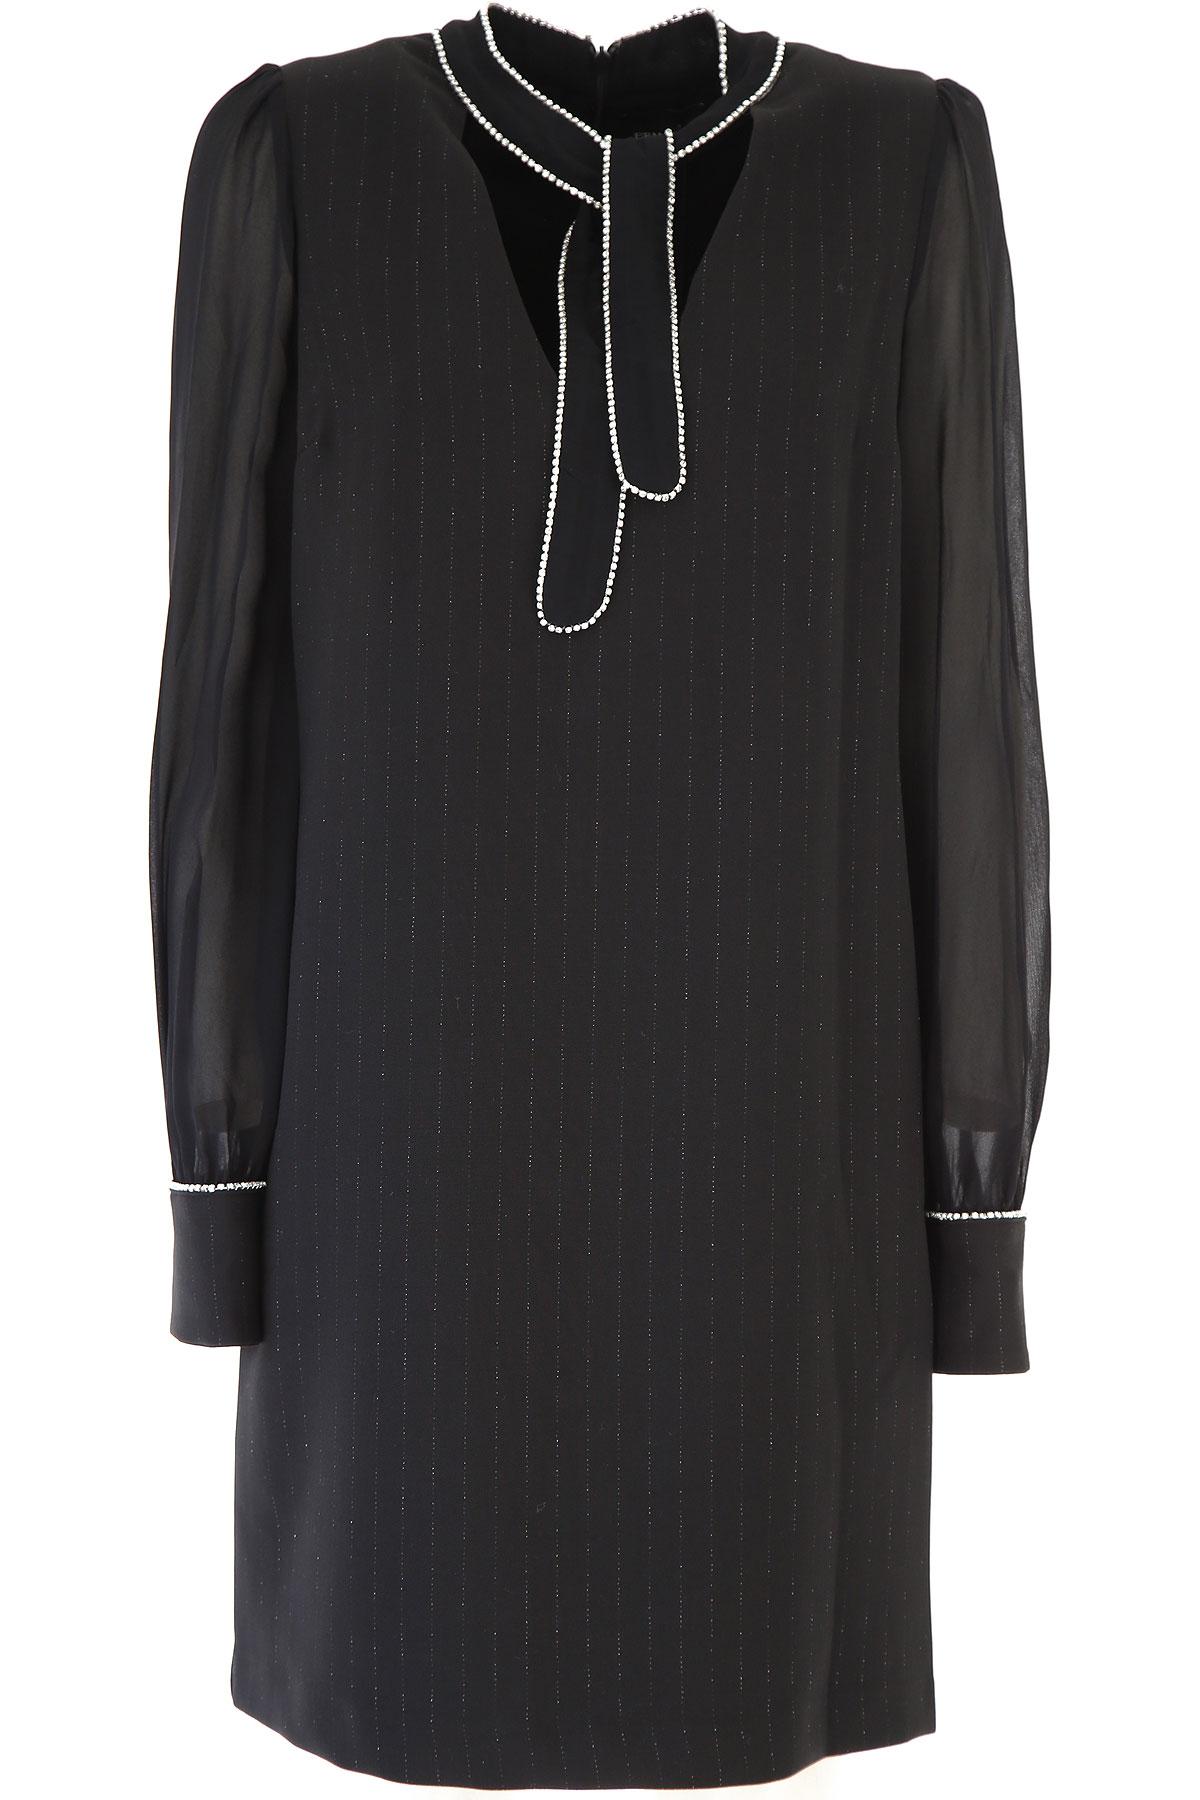 Ermanno Scervino Dress for Women, Evening Cocktail Party On Sale, Black, Viscose, 2019, 4 6 8